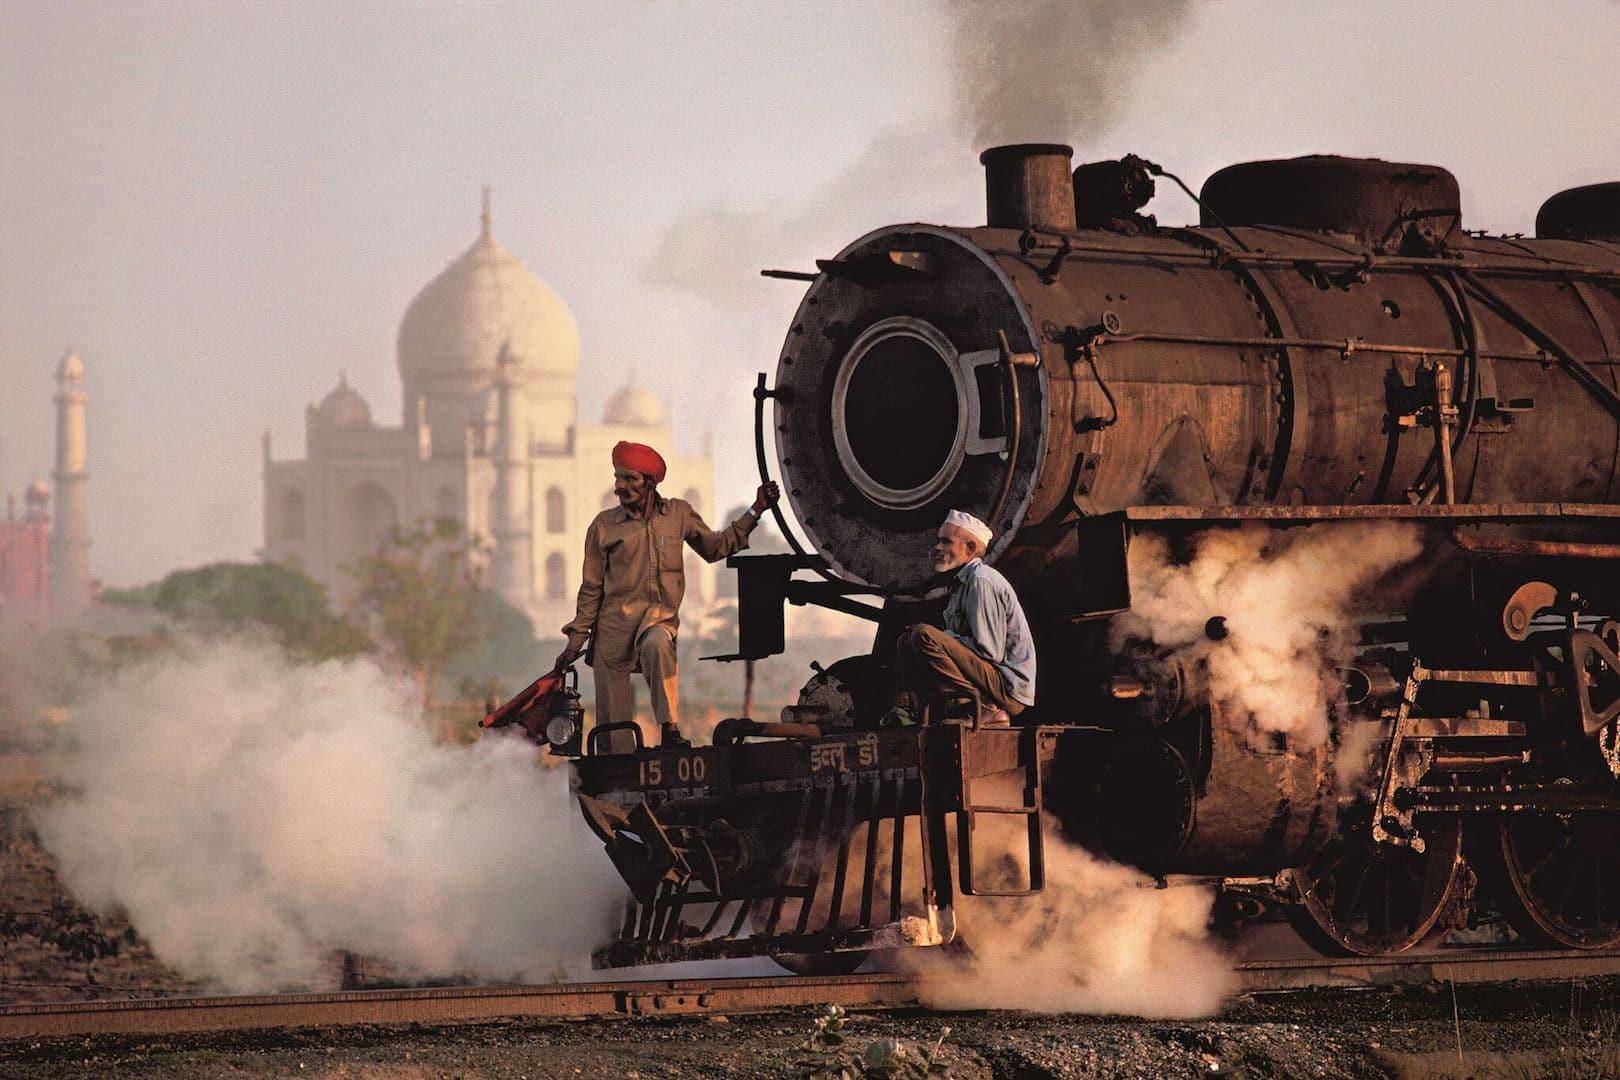 Taj and Train by Steve McCurry